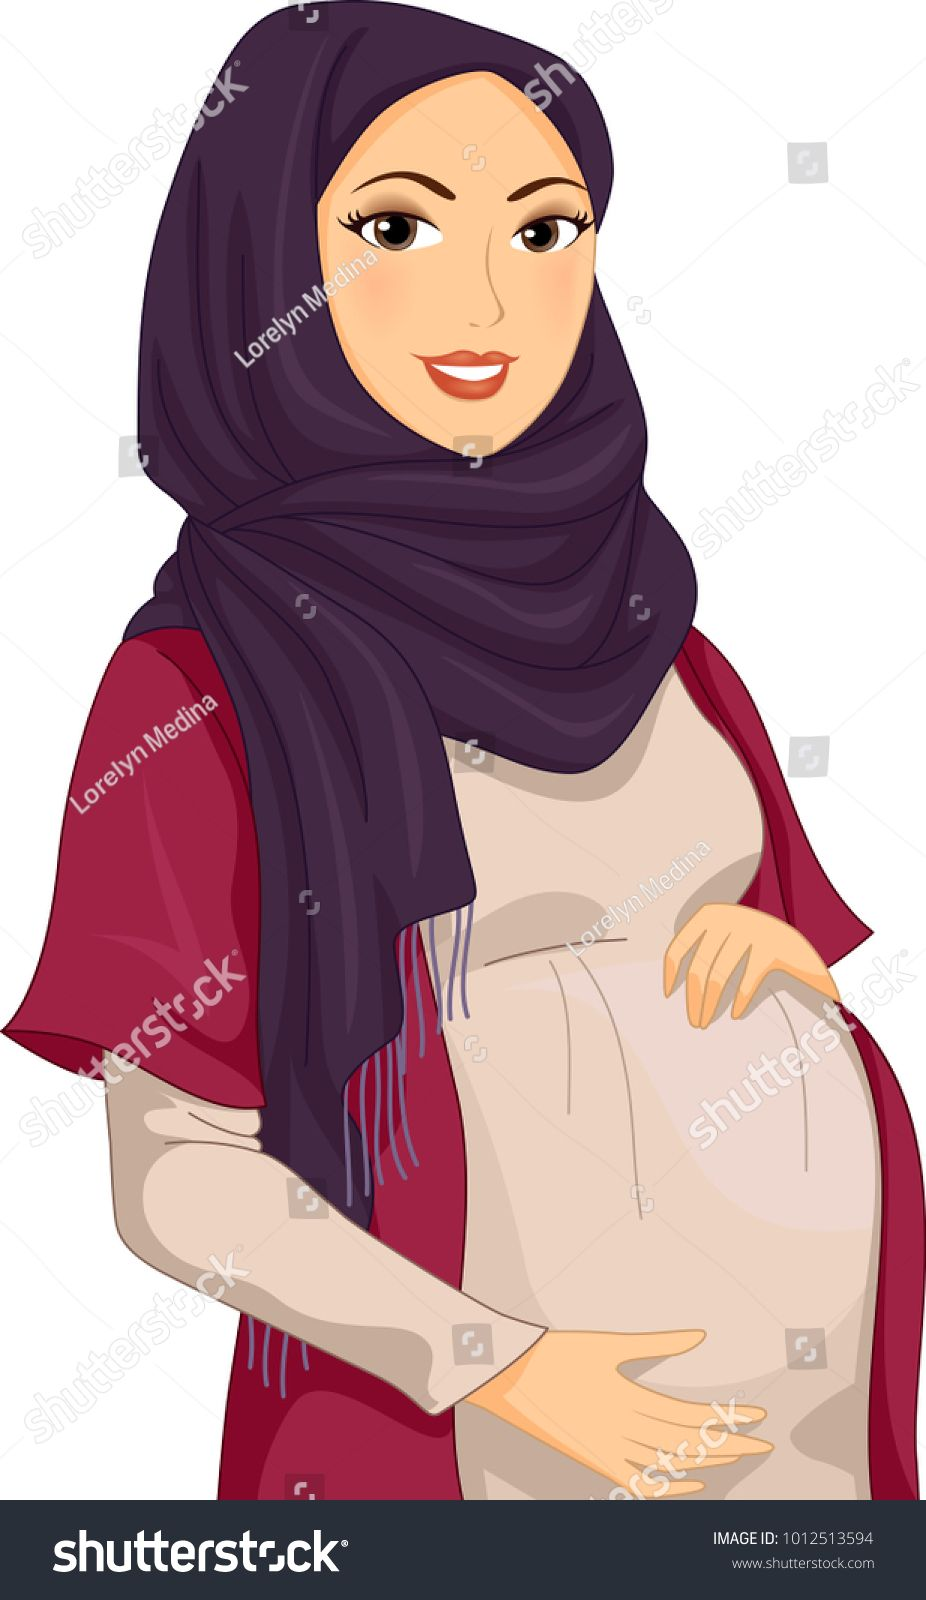 Illustration of a Pregnant Muslim Girl Wearing Hijab